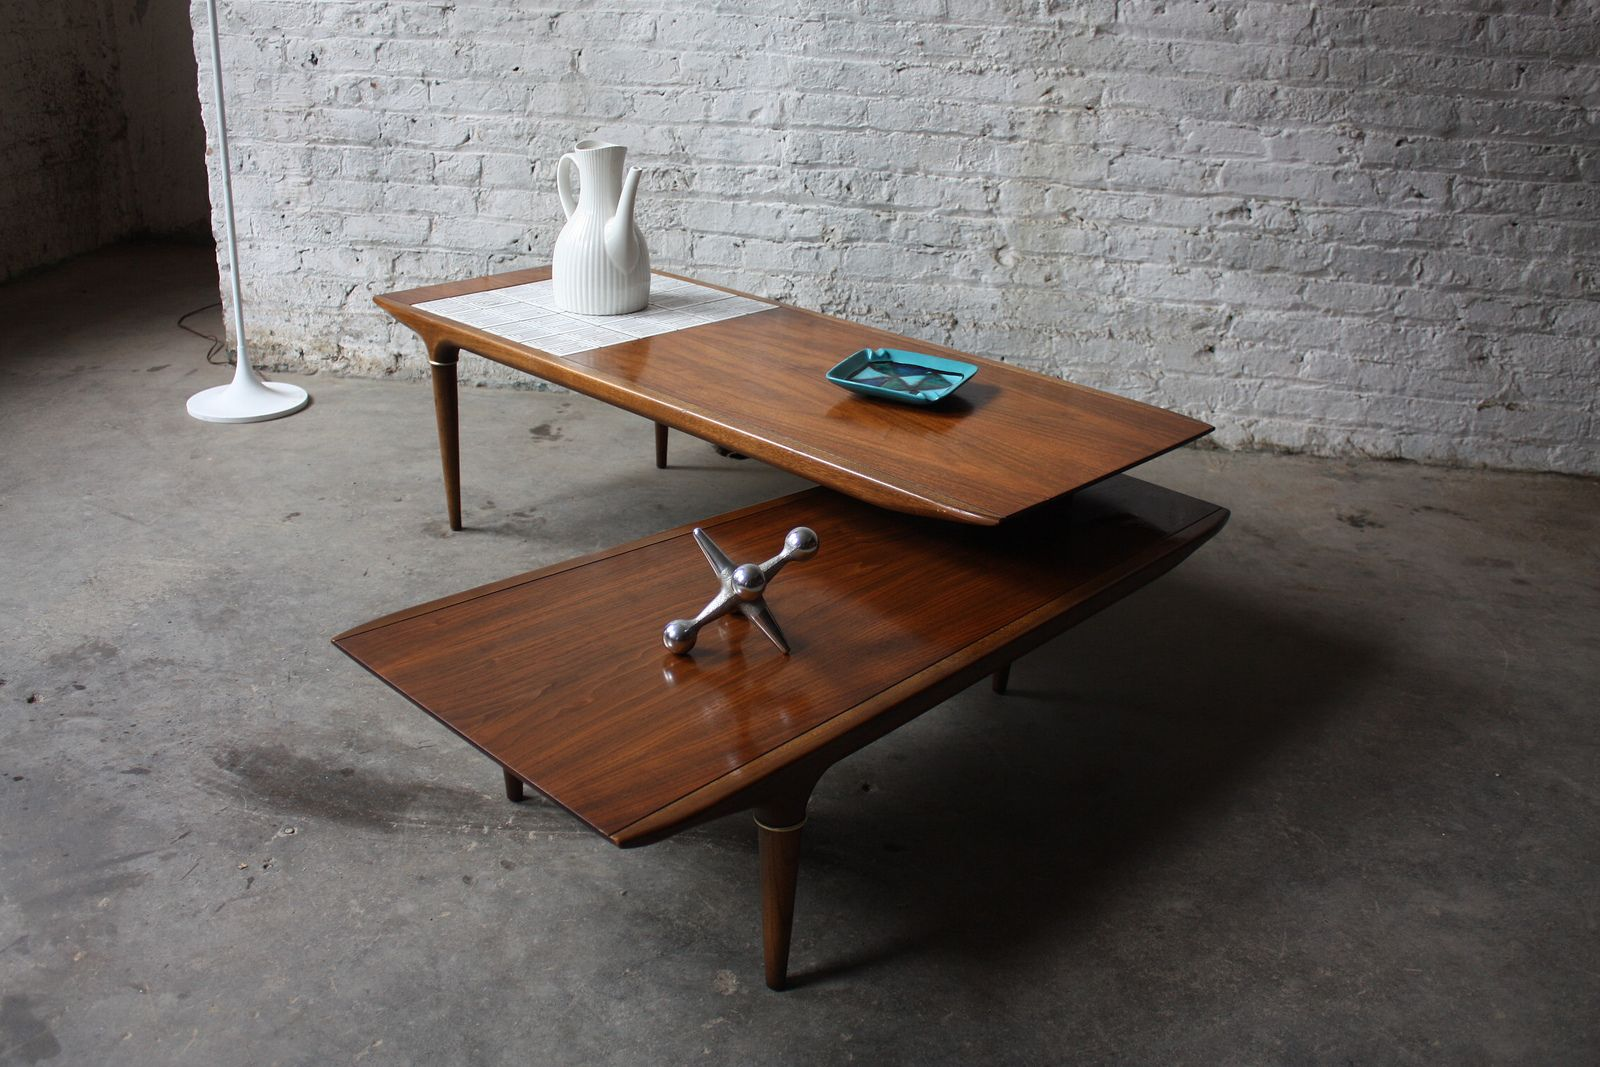 Rare Lane Swivel Pivot Boomerang Mcm Walnut Coffee Table U S A 1960 S Coffee Table Usa Coffee Table Coffee Table Vintage [ 1067 x 1600 Pixel ]